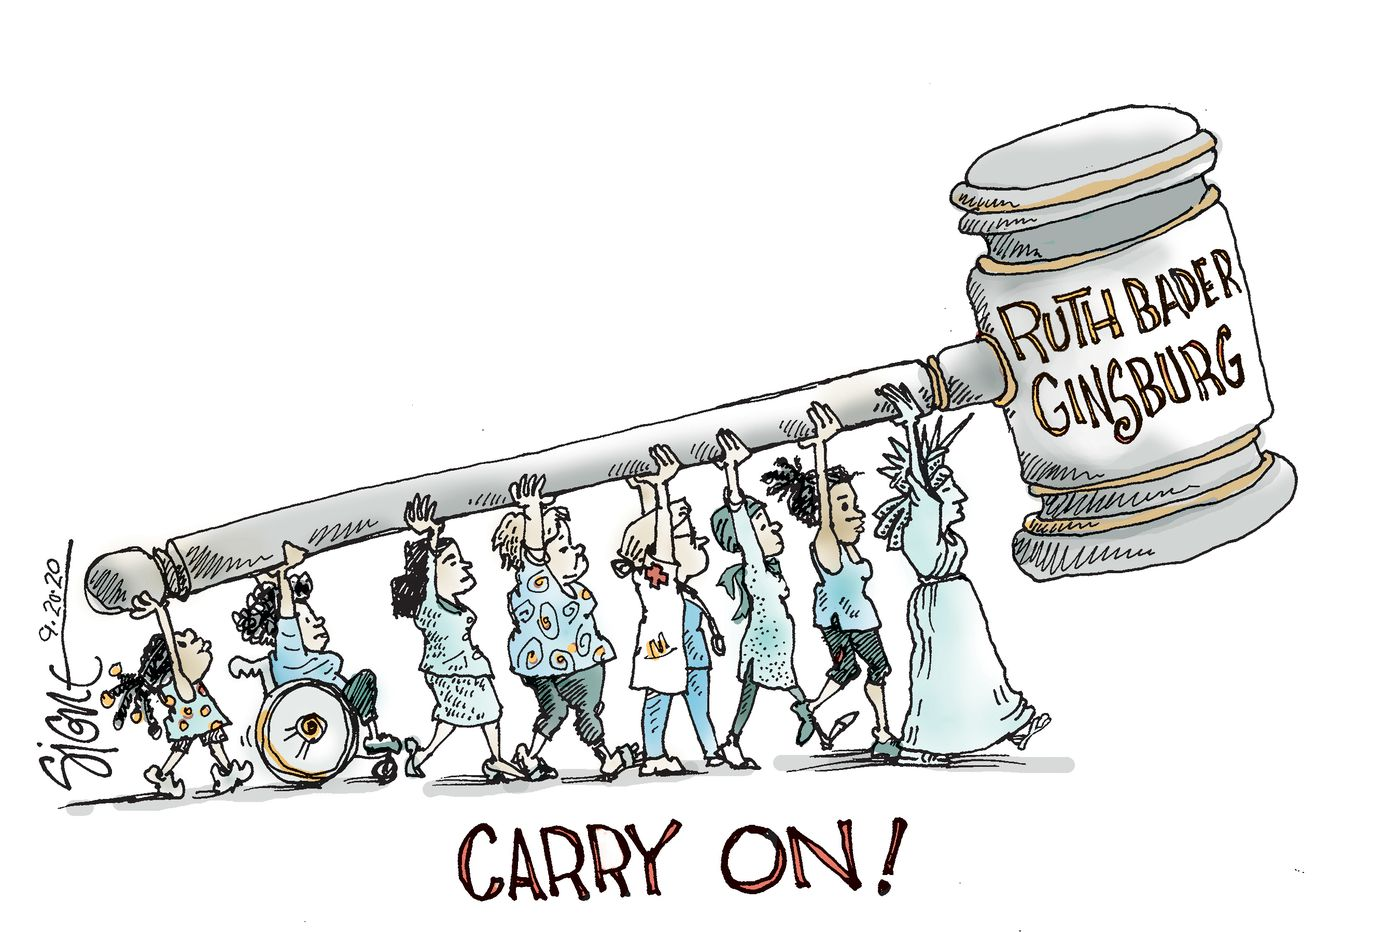 Political Cartoon: Ruth Bader Ginsburg's followers